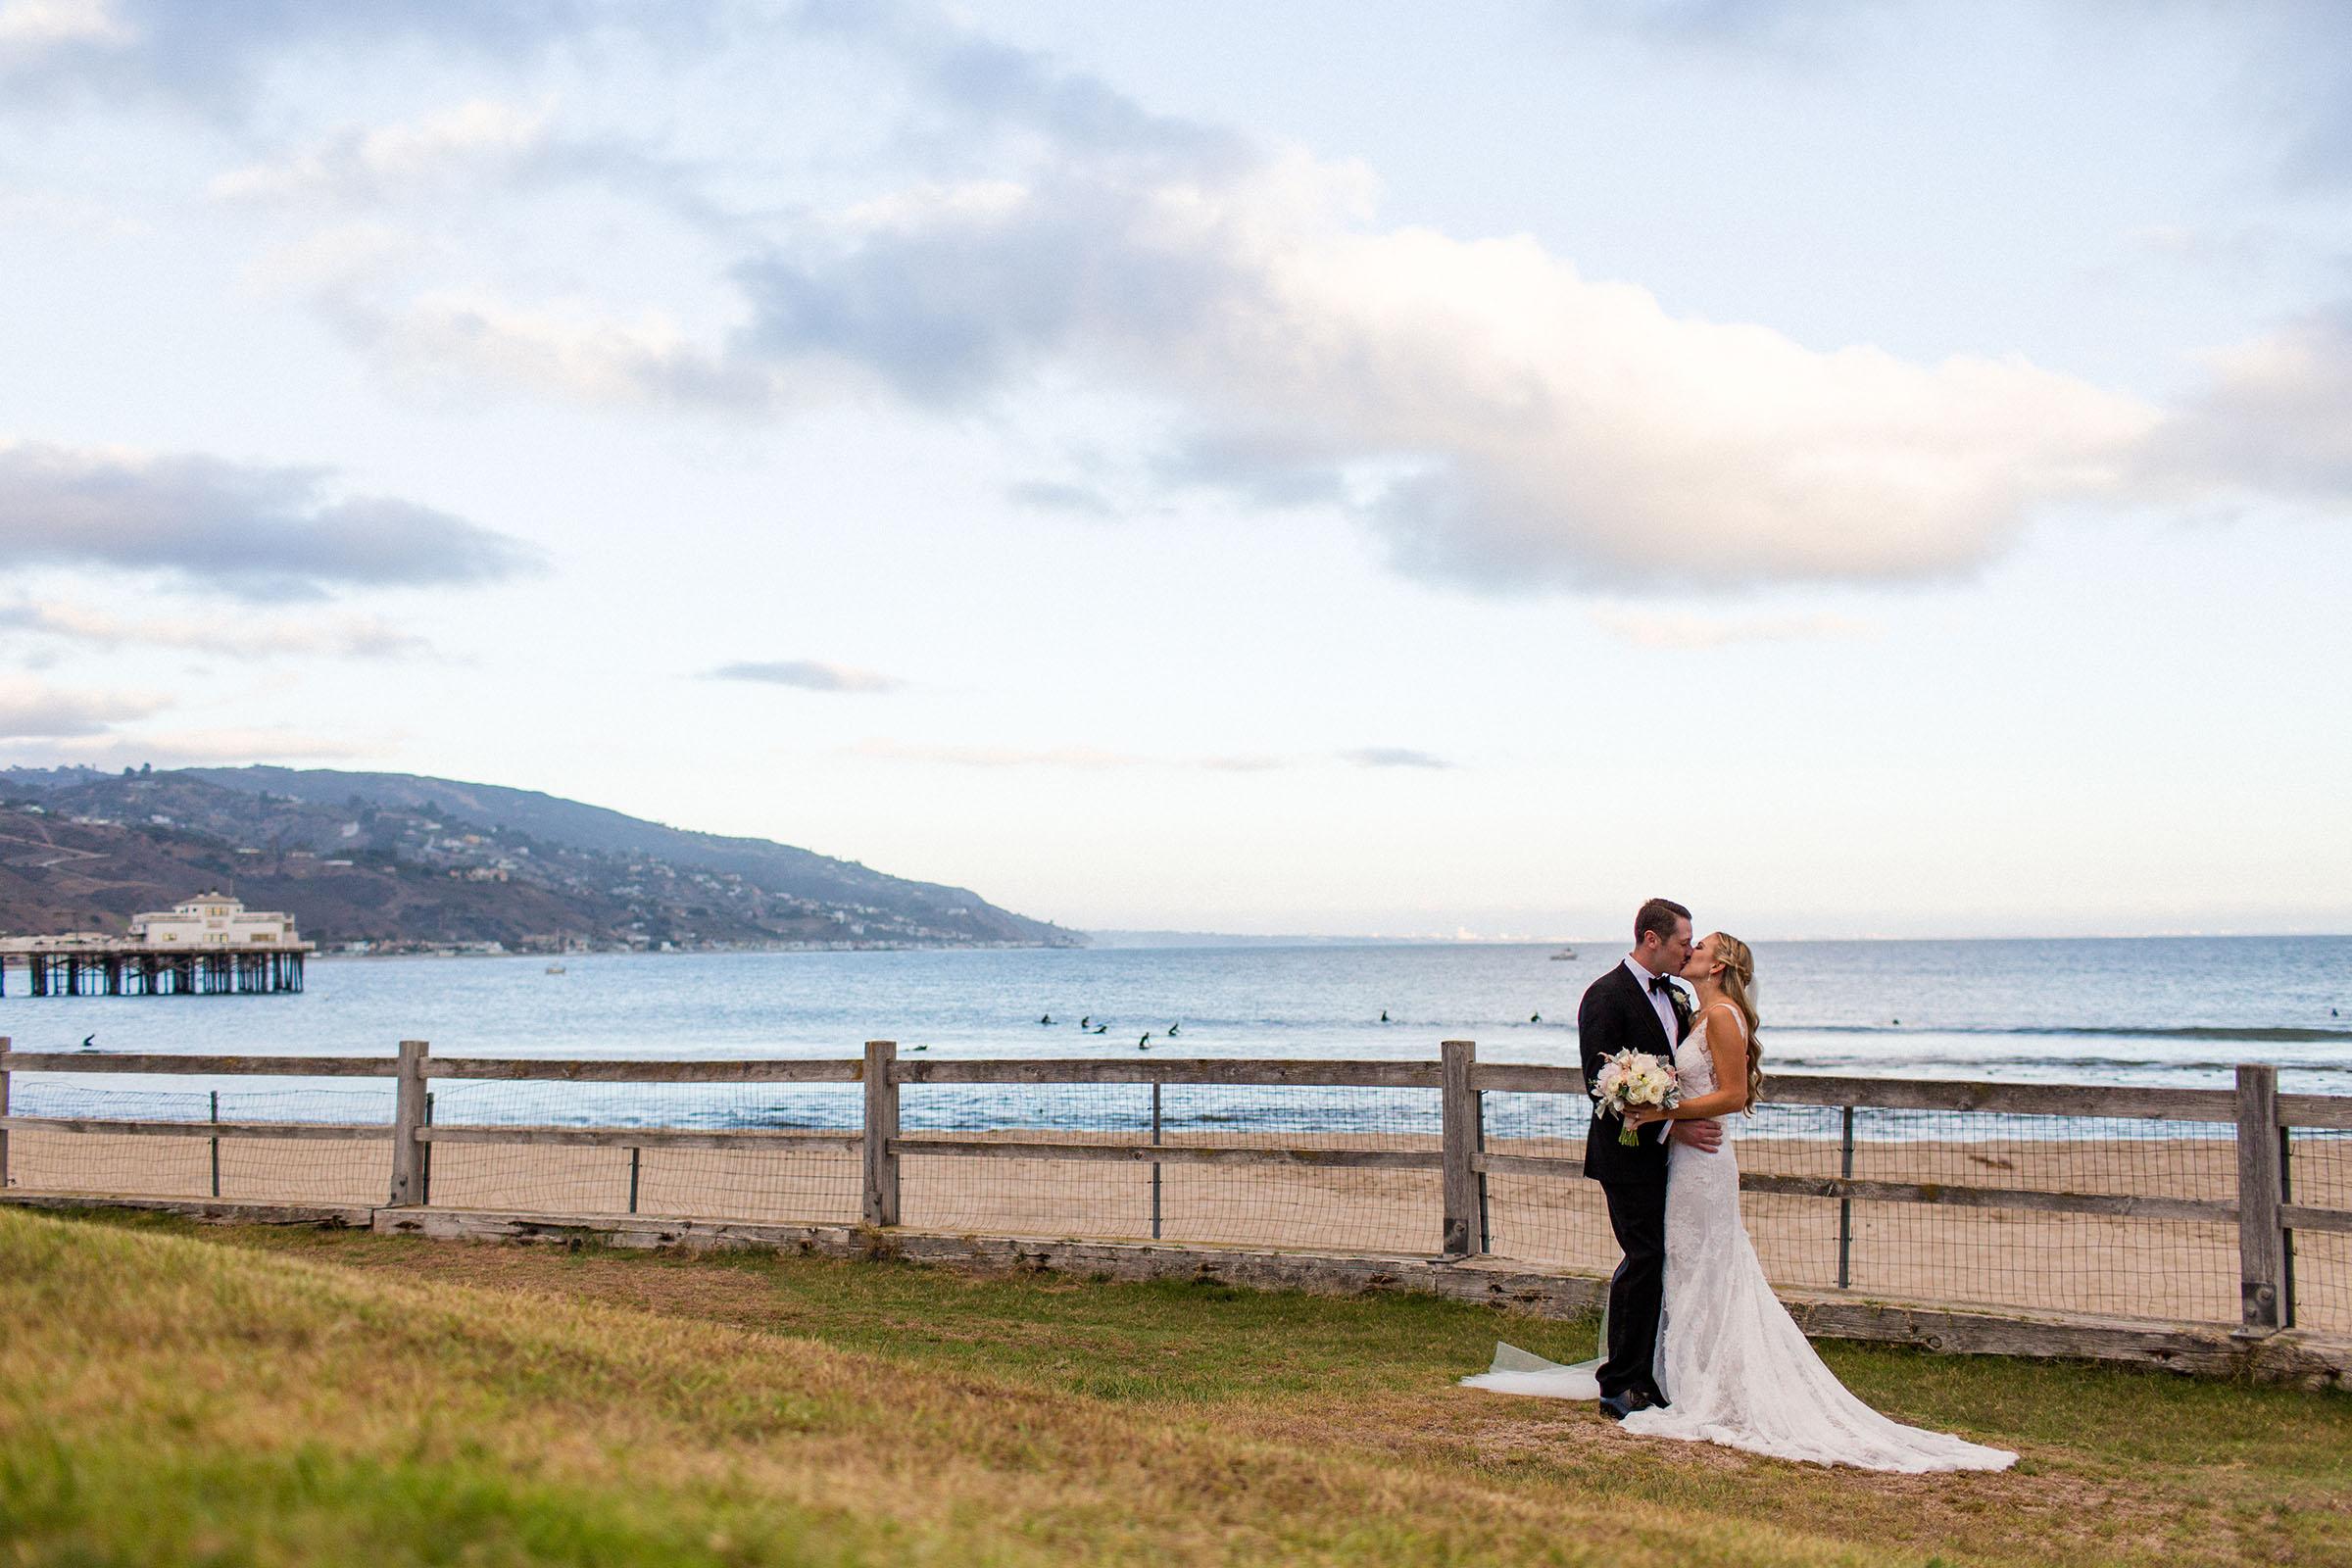 thevondys.com   Adamson House Photography   Malibu Wedding Photographer   The Vondys